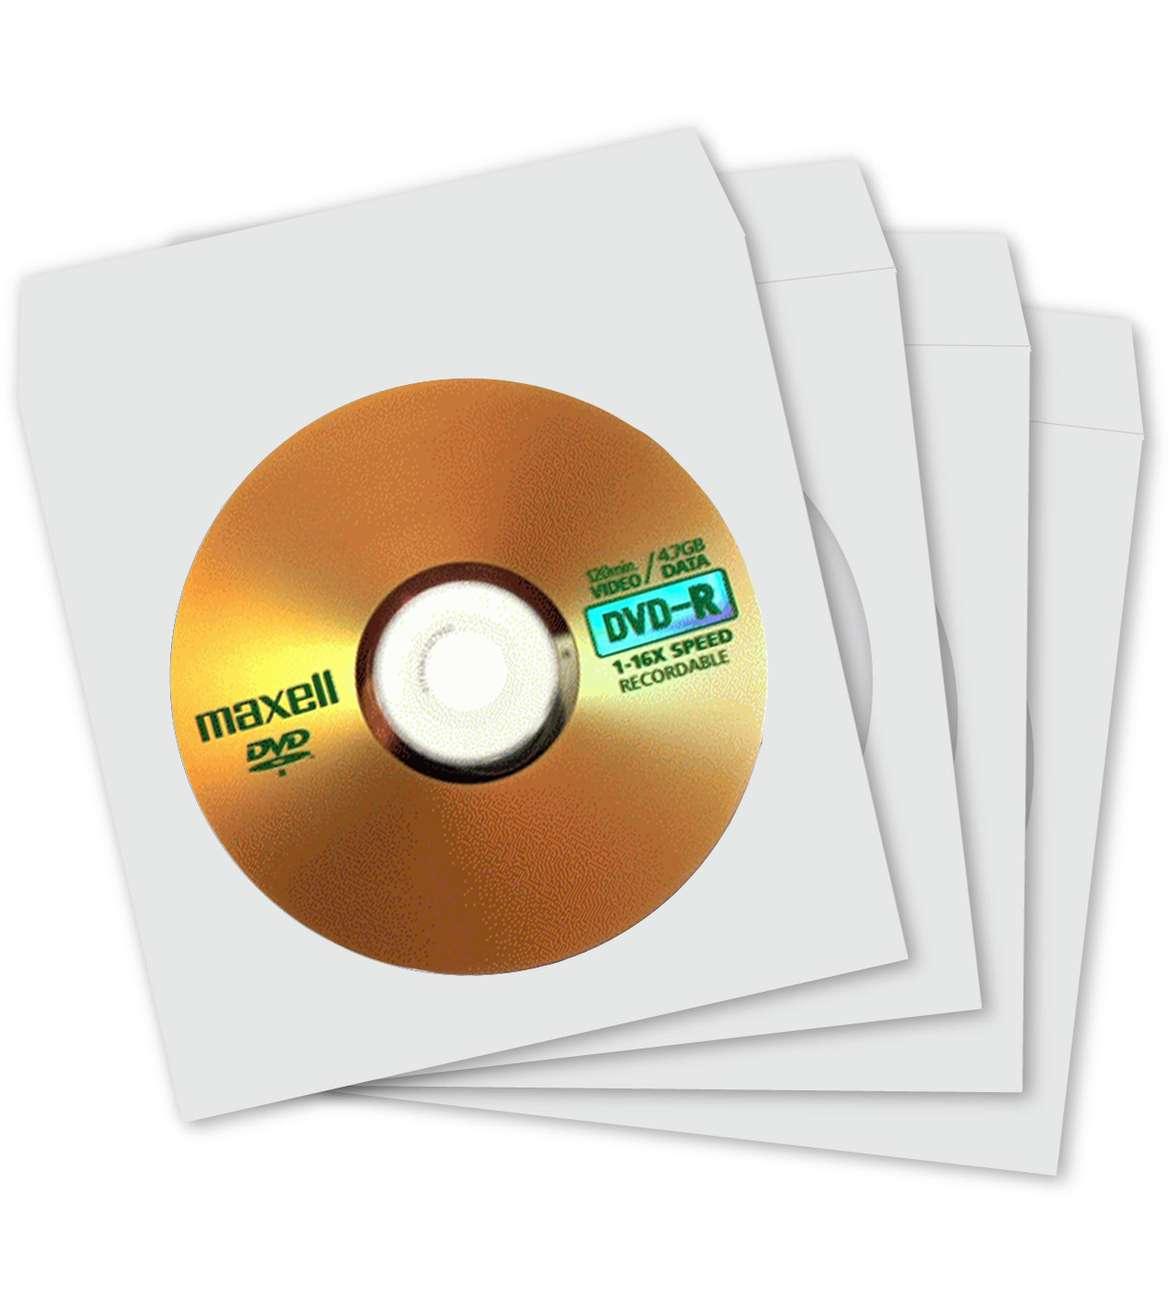 Maxell DVD-R 4.7GB 16X papirna kesa